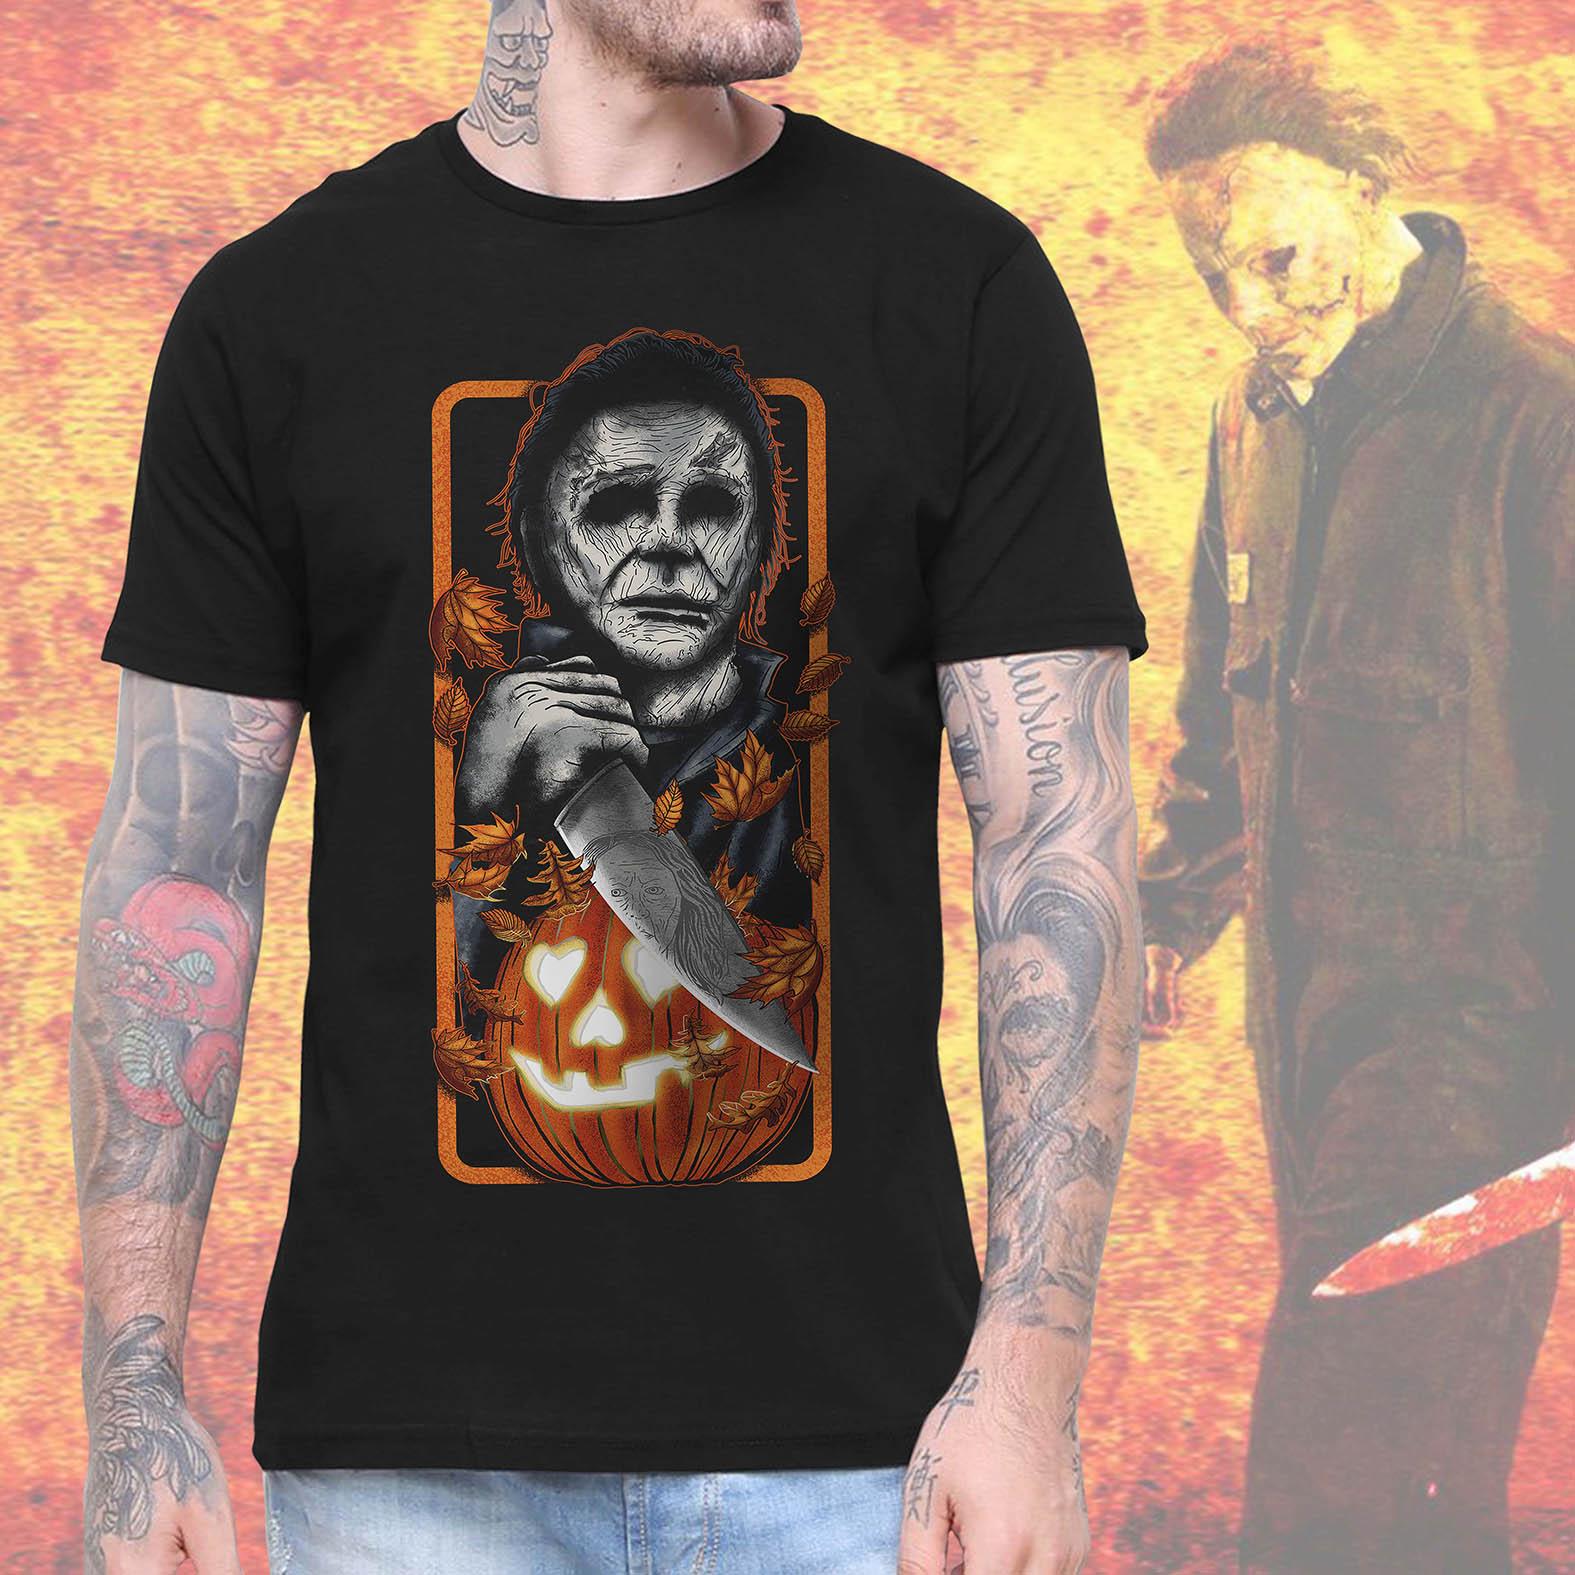 Camiseta Masculina Unissex Michael Myers Halloween Abóbora Terror Horror Serial Killer (Preta) - EV